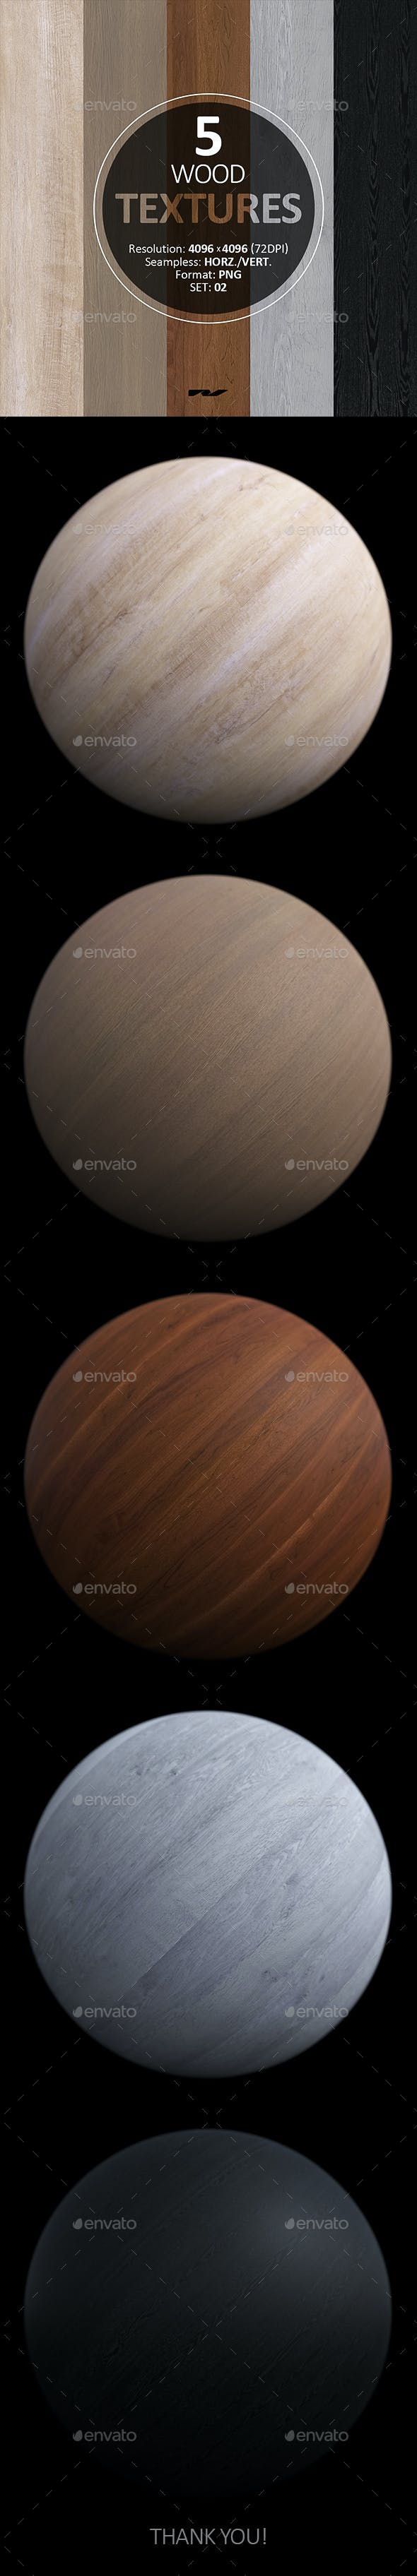 5 Wood Textures 4096x4096 / 72dpi / PNG. Set 02 - 3DOcean Item for Sale